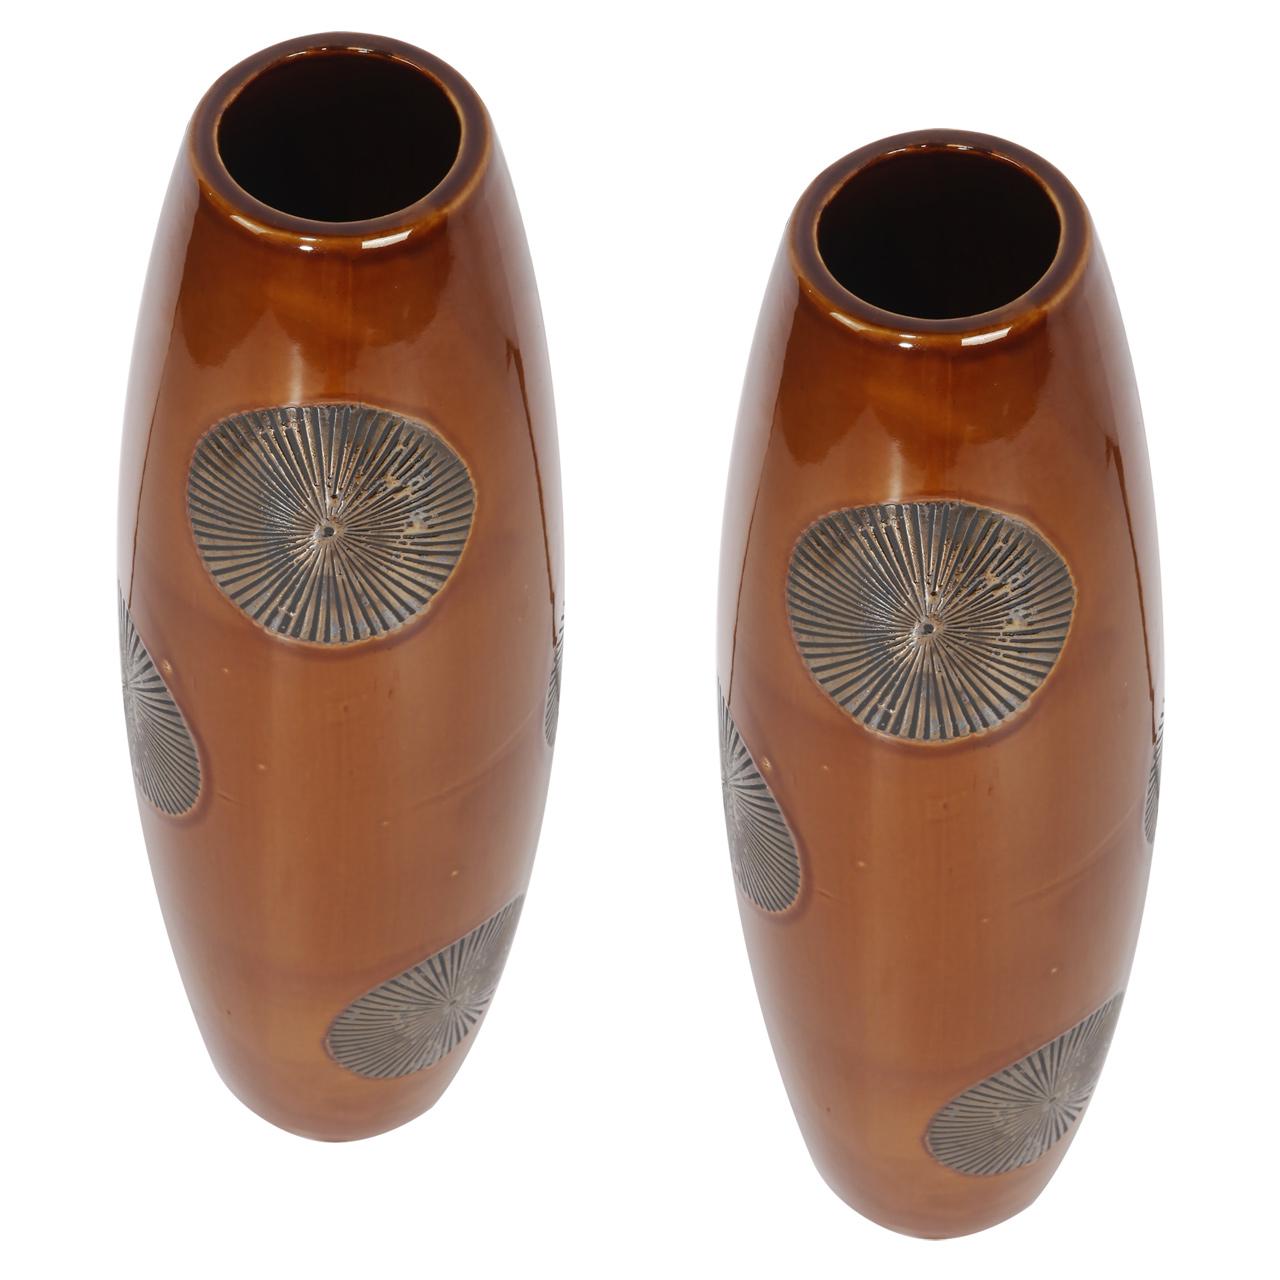 {} ARTEVALUCE Ваза Ria Цвет: Оранжевый (13х13х41 см - 2 шт) artevaluce ваза ria цвет оранжевый 13х13х41 см 2 шт